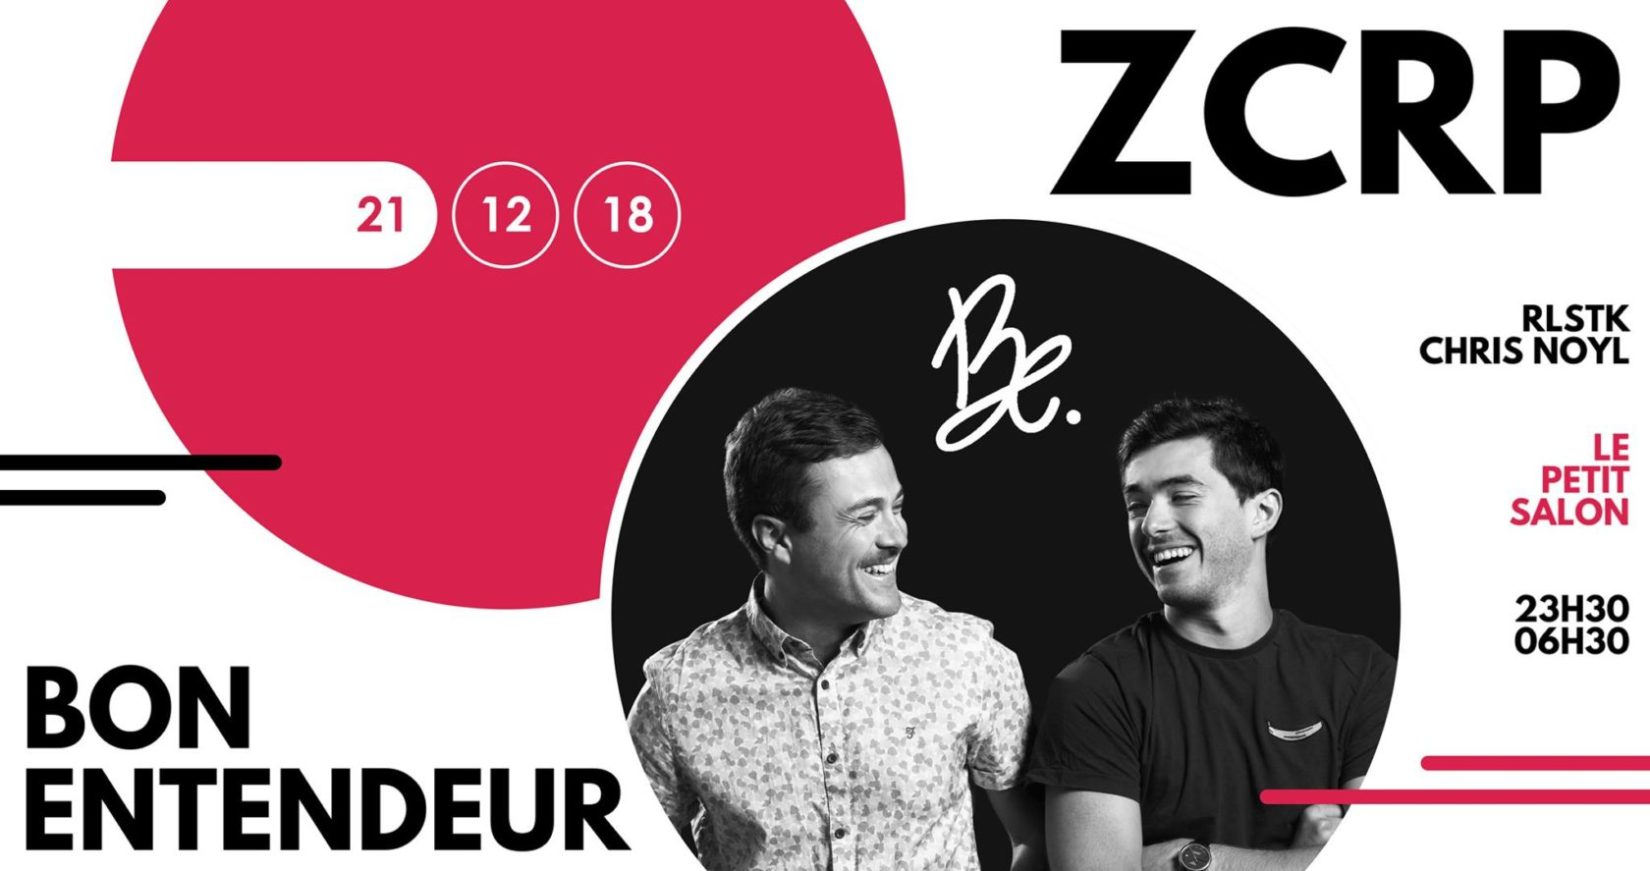 Zoo Corp inv. Bon Entendeur